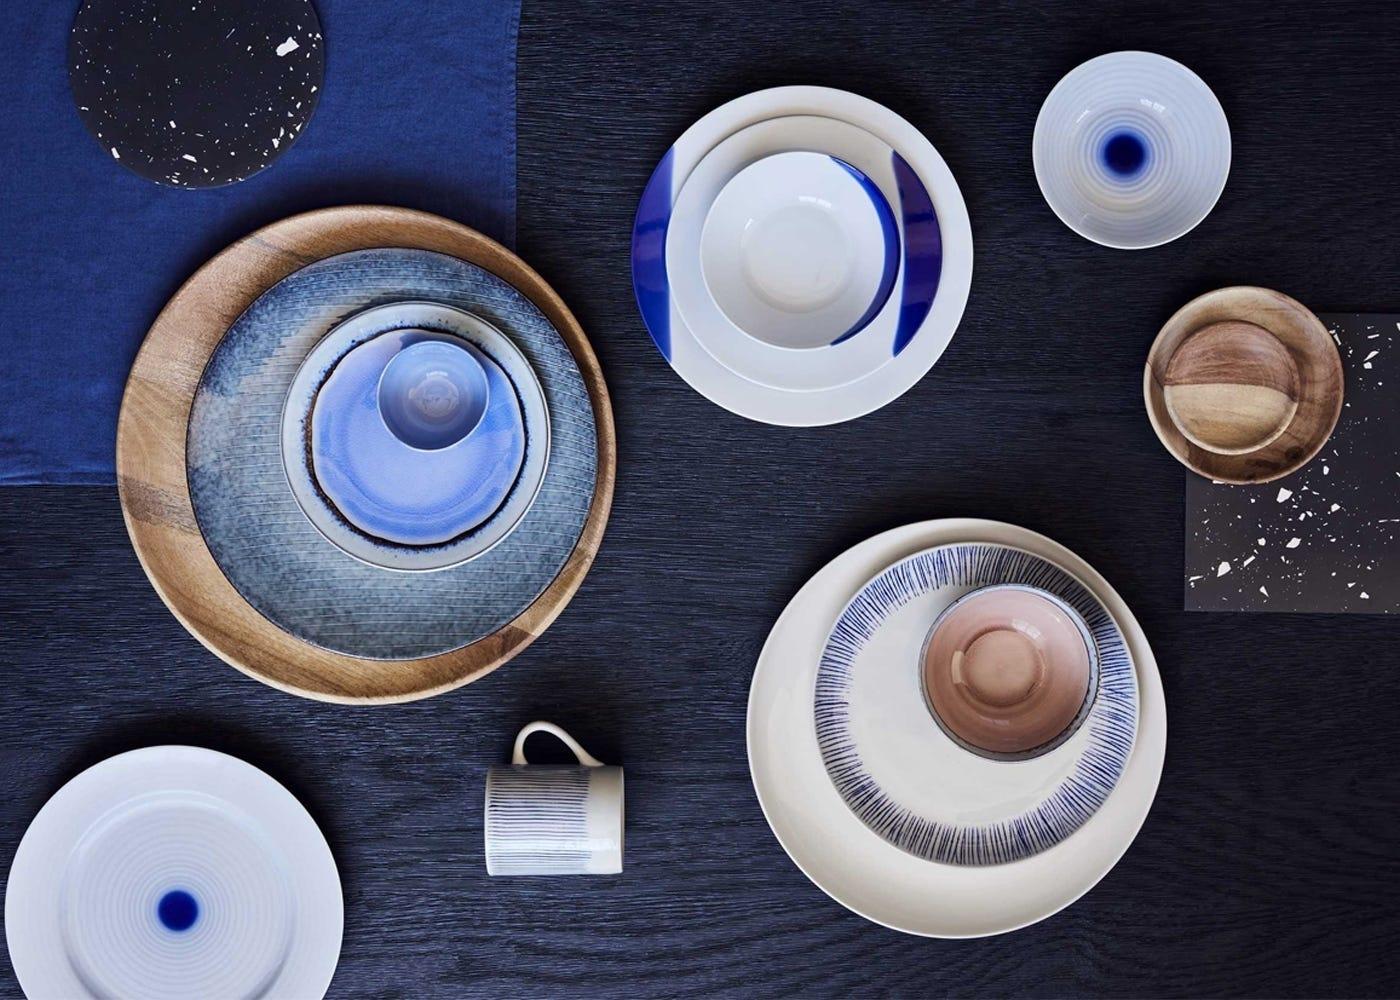 AW17 tableware range featuring ranges; Blue Marble, Dakara, Karuma, Biviri, Spiral, Touch of Blue.